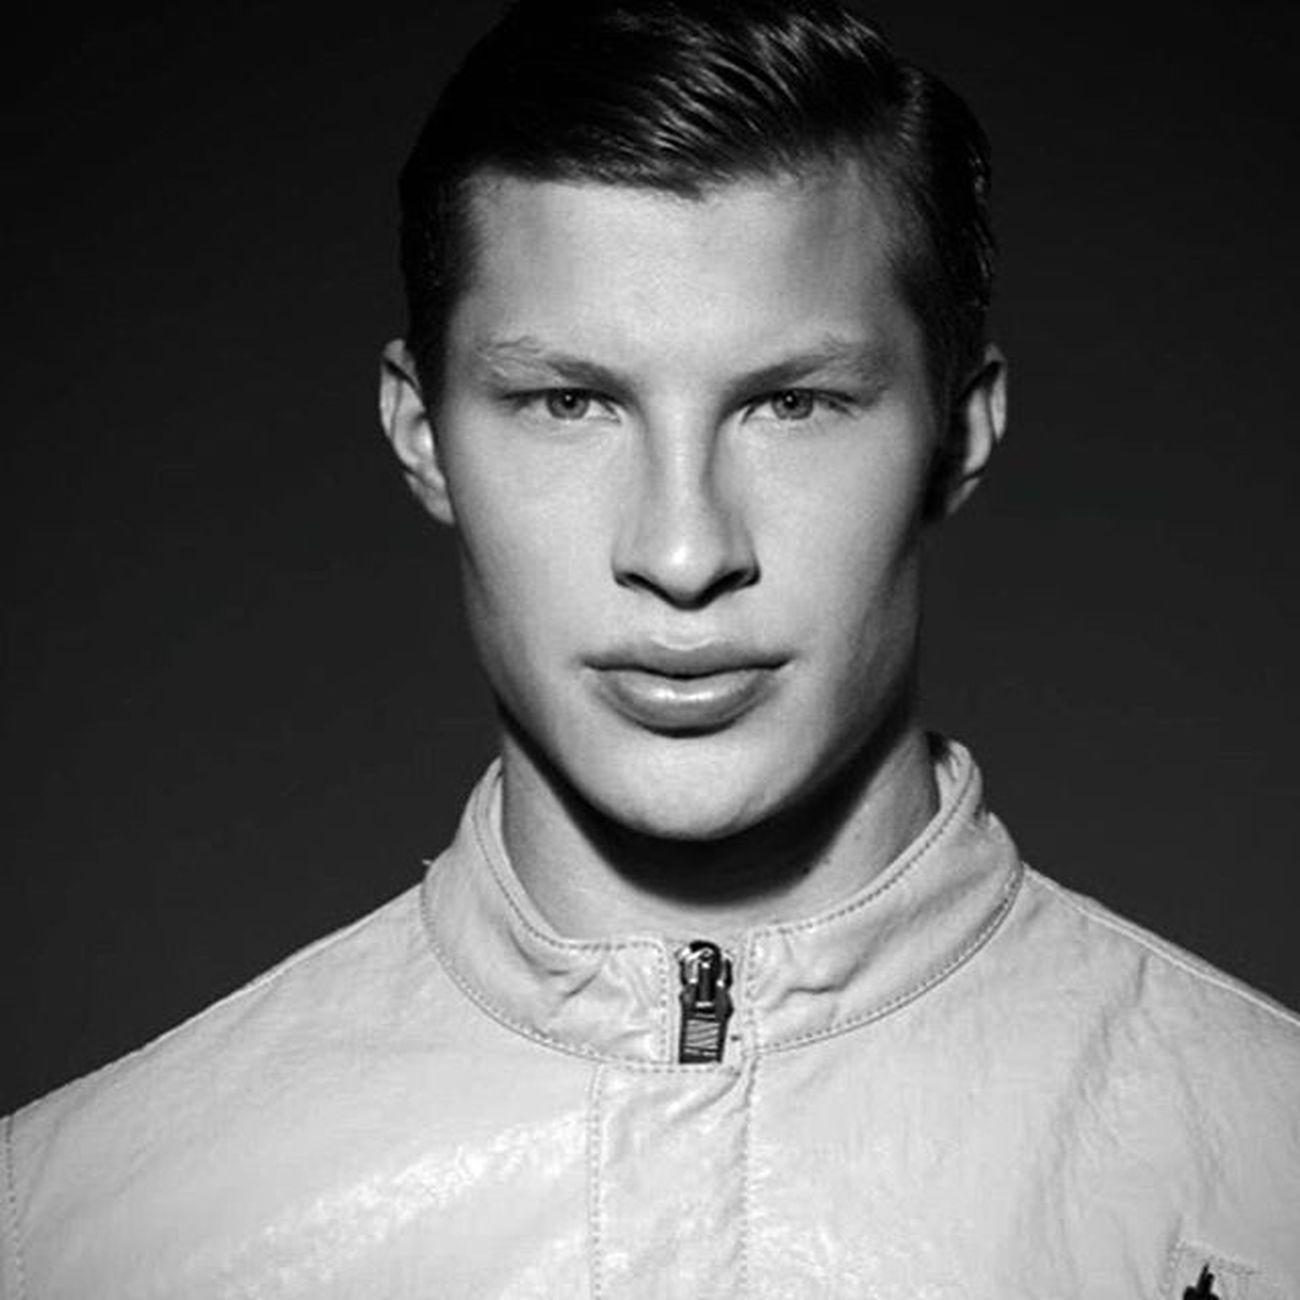 Stunning Men model by @kreerath grooming by @torratymakeup Activity Beauty Skine Grooming menmodel nyc test shoot monday